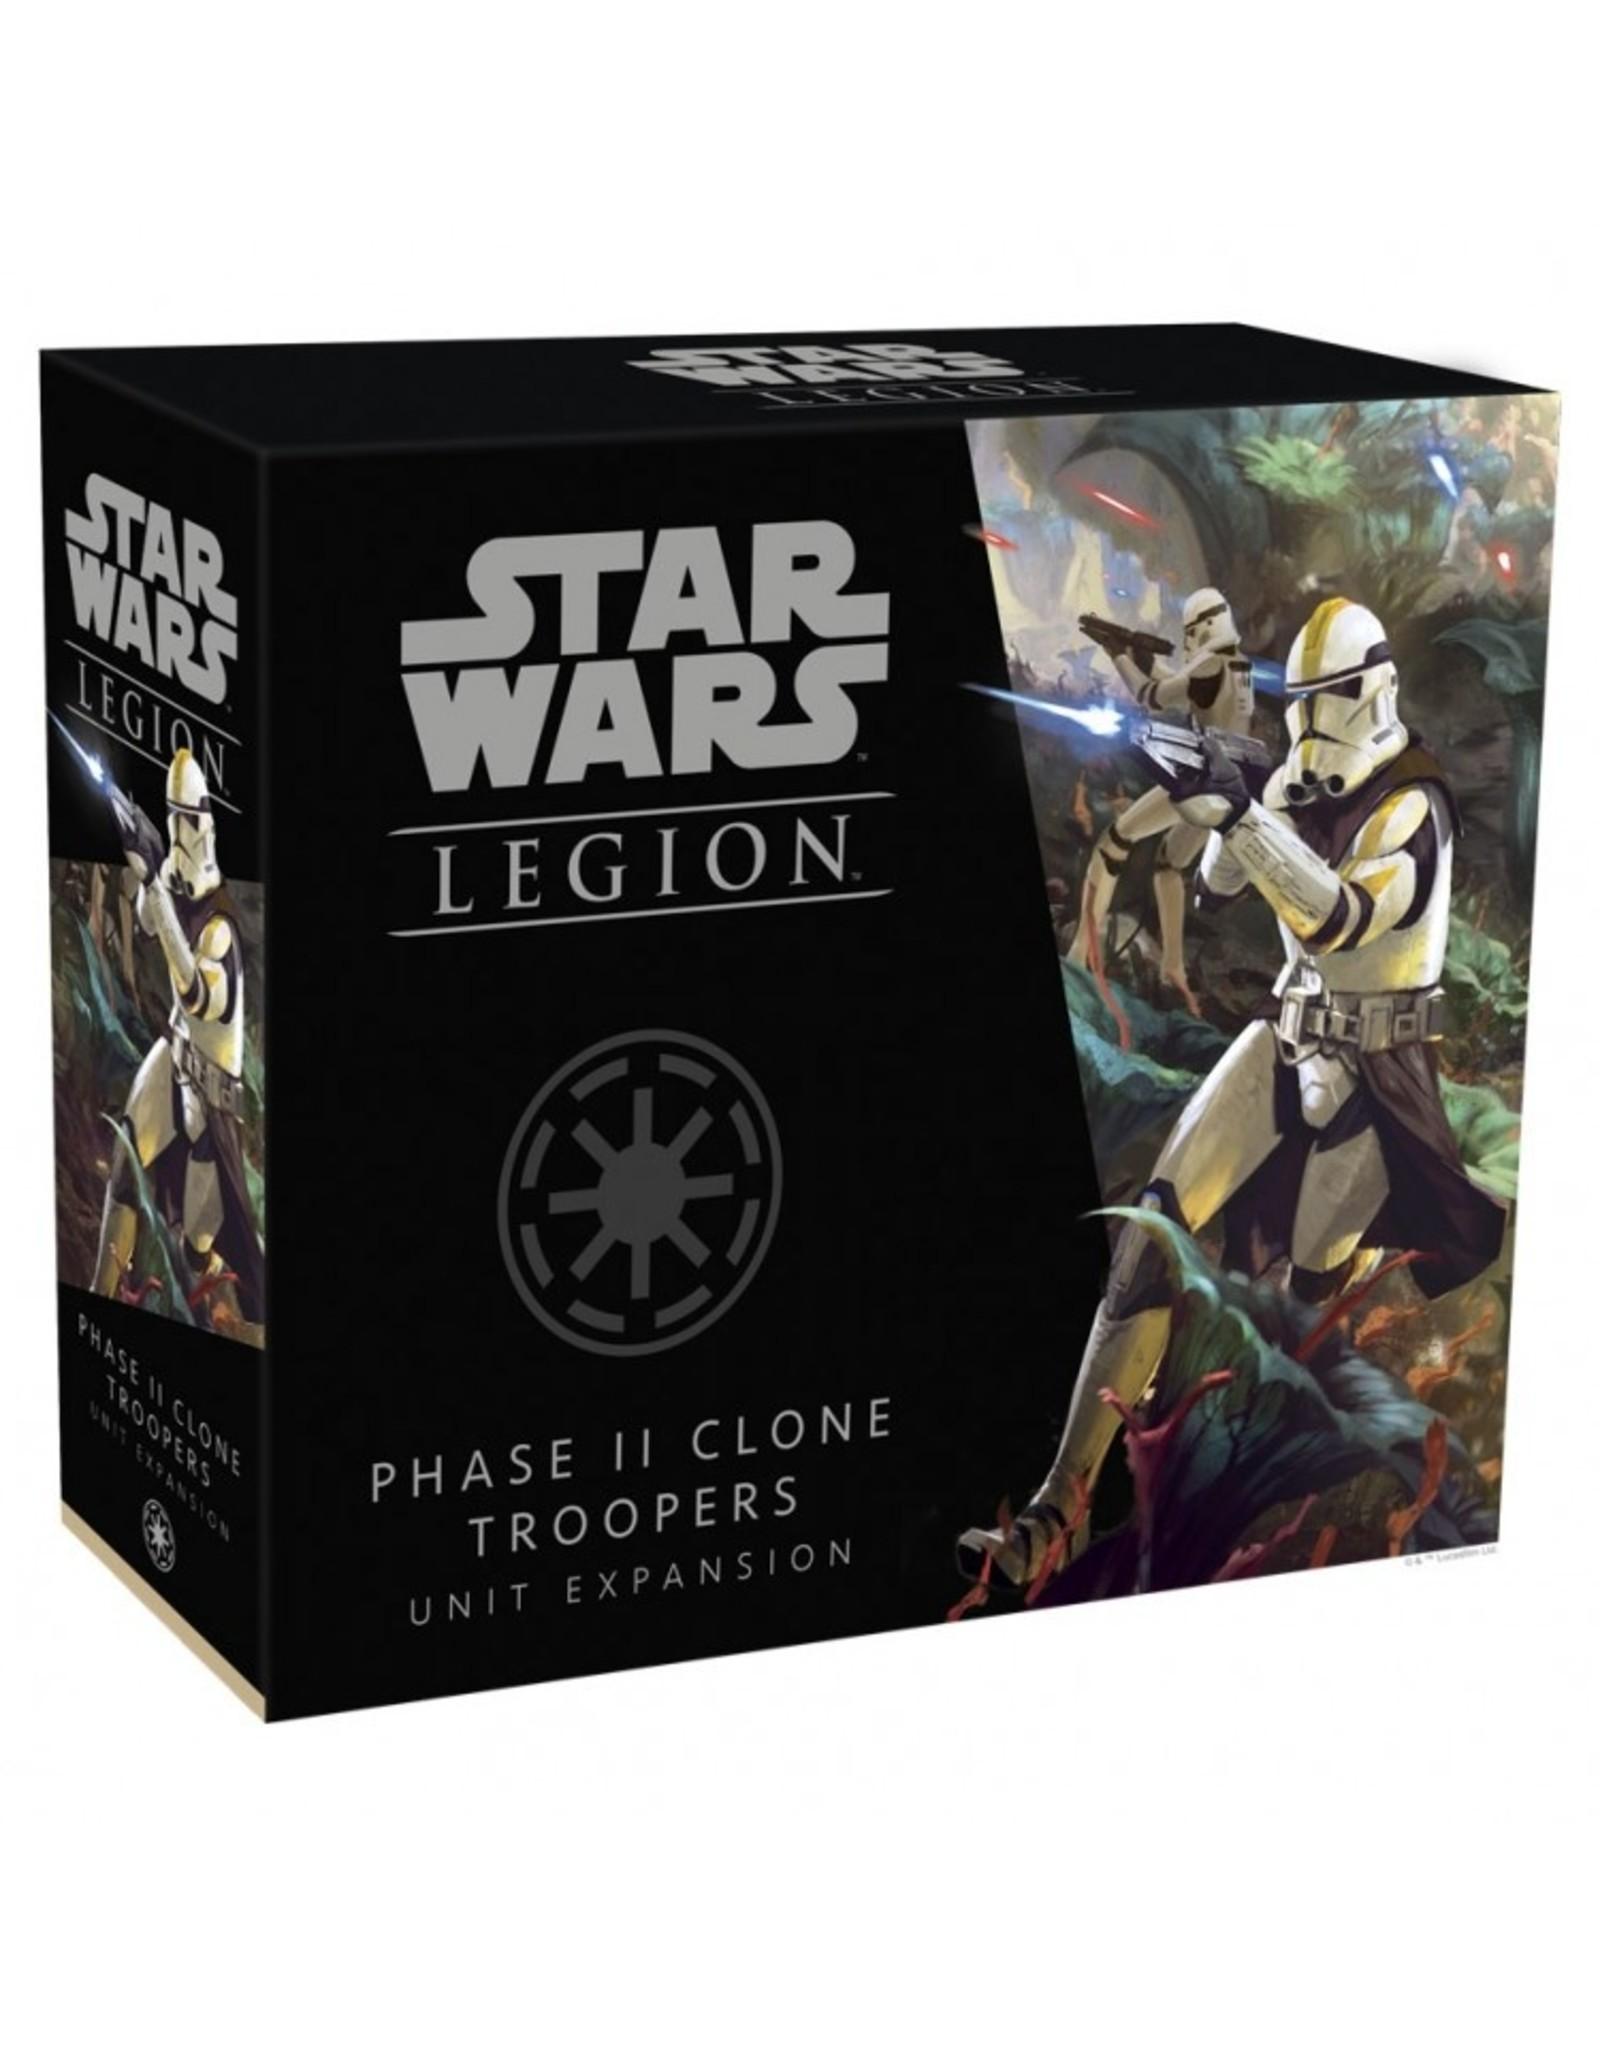 Fantasy Flight Games Star Wars: Legion - Phase II Clone Troopers Unit Expansion